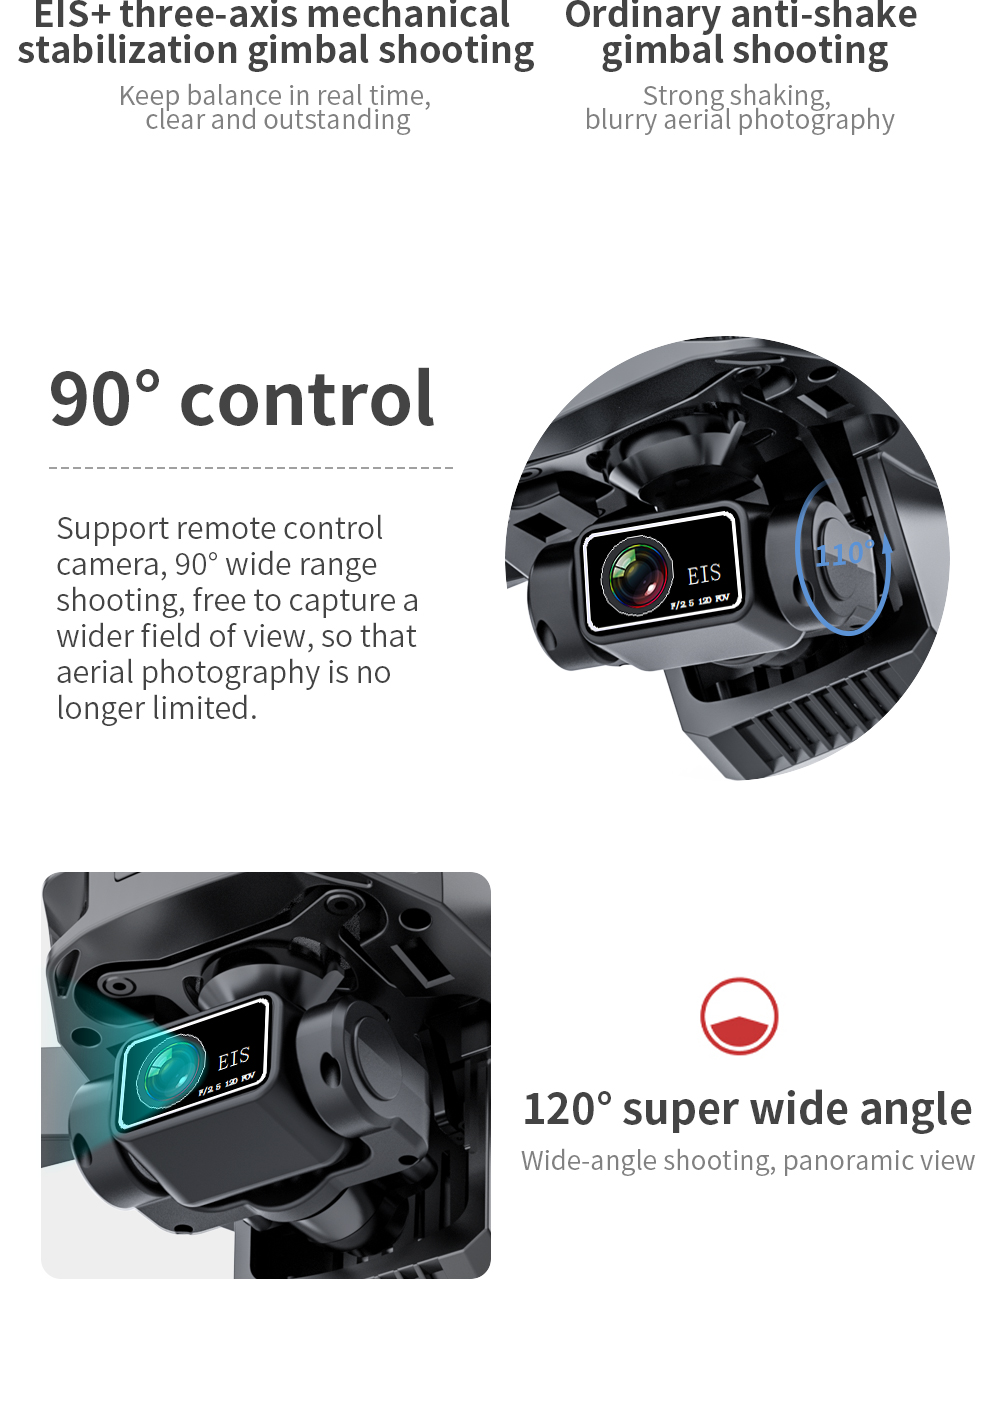 H72064edf74ce4e30ae56fbe72d1f31ecx - New KF101 GPS Drone 4K Professional 8K HD EIS Camera Anti-Shake 3-Axis Gimbal 5G Wifi Brushless Motor RC Foldable Quadcopter